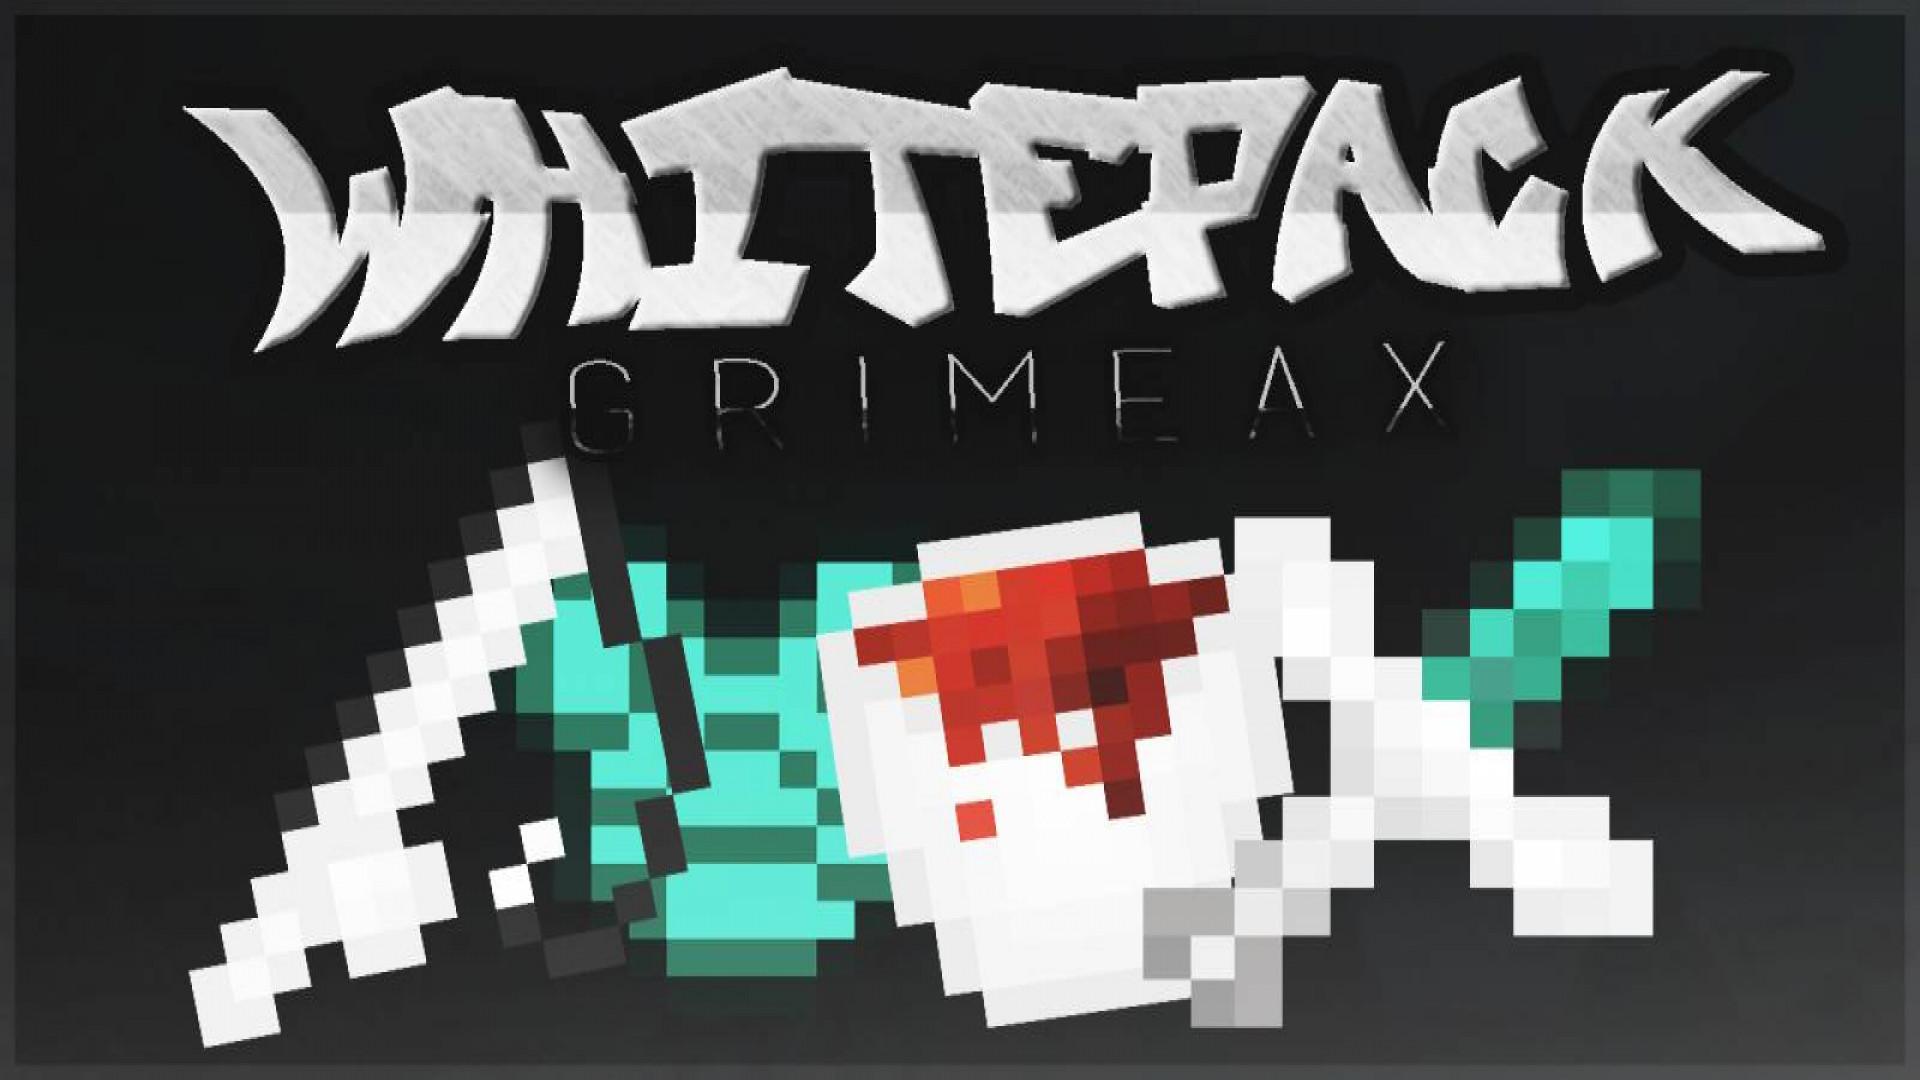 Grimeax White Pack